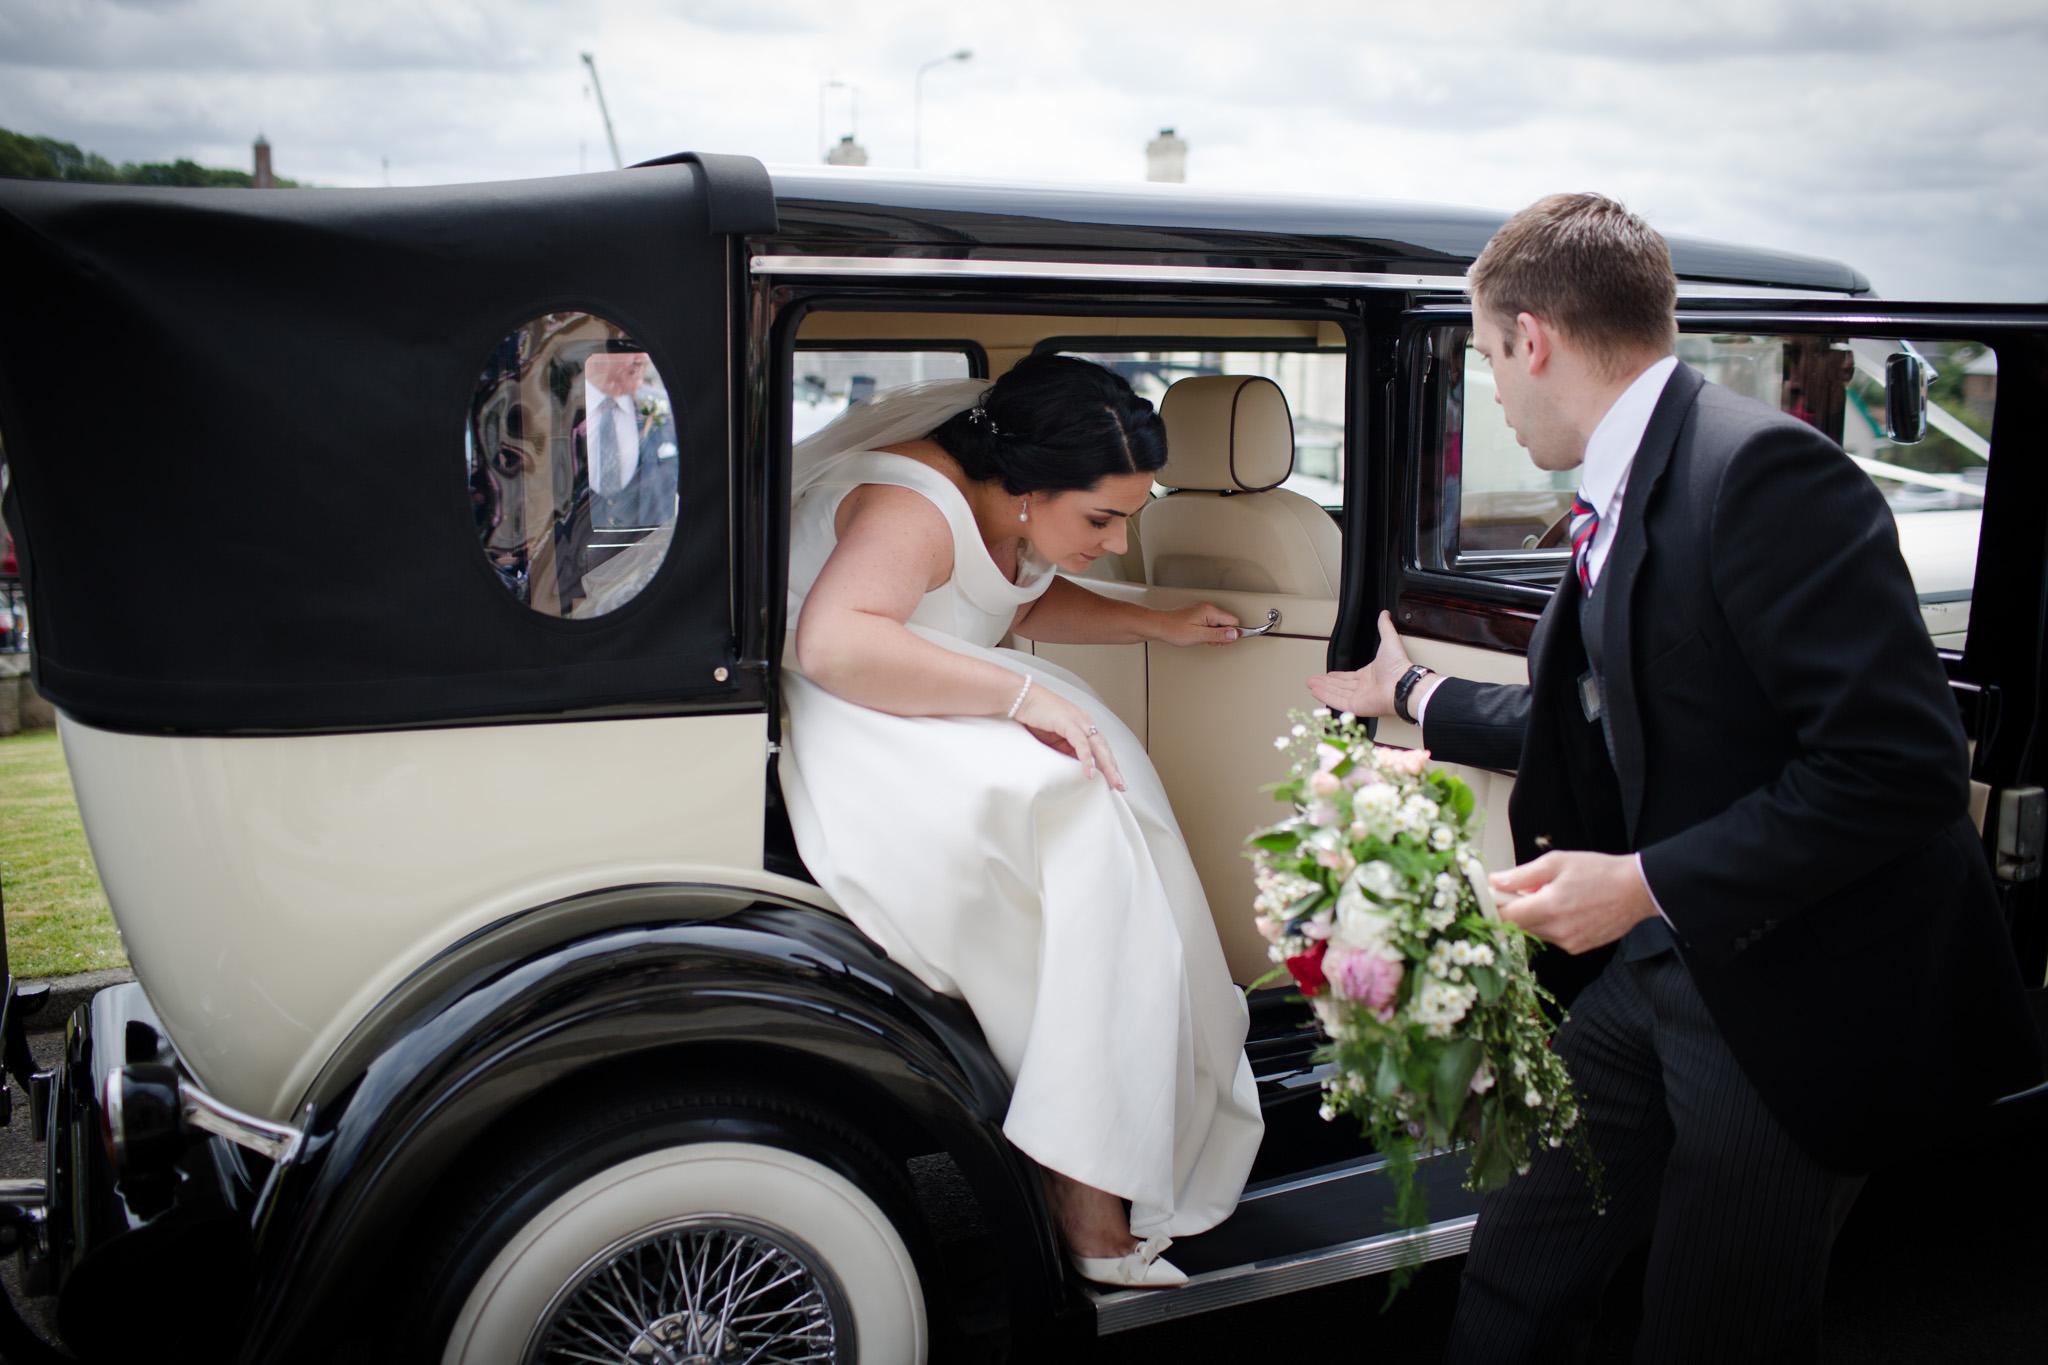 Mark_Barnes_Northern_Ireland_Wedding_Photography_Lusty_Beg_Wedding_Photography_Hayley&Brian-12.jpg